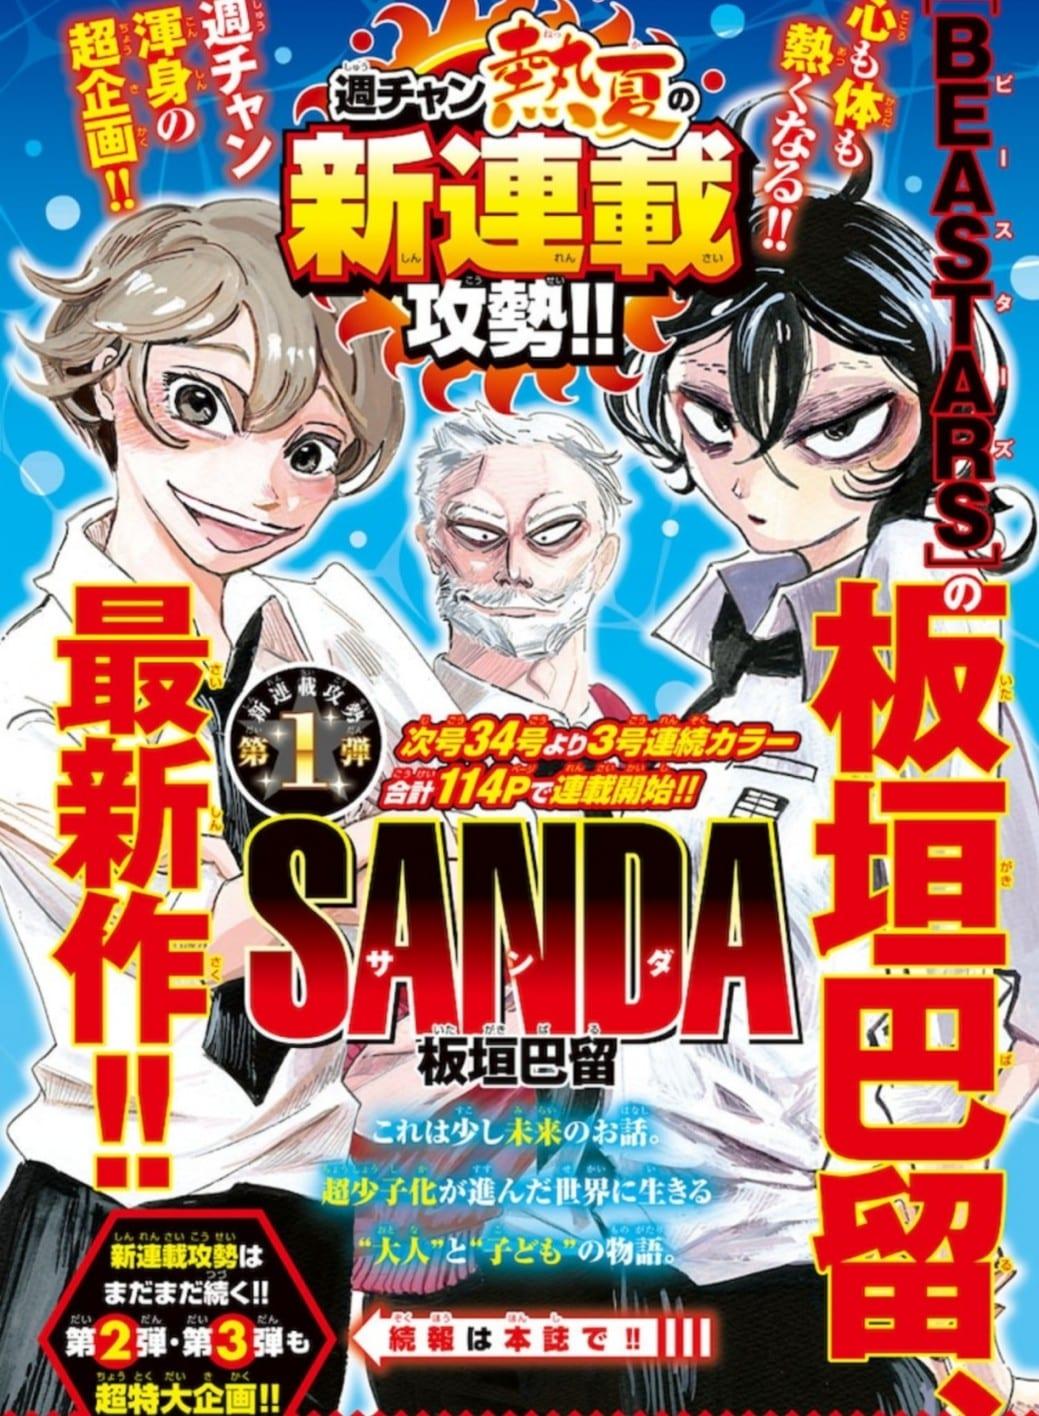 sanda manga by Paru Itagaki